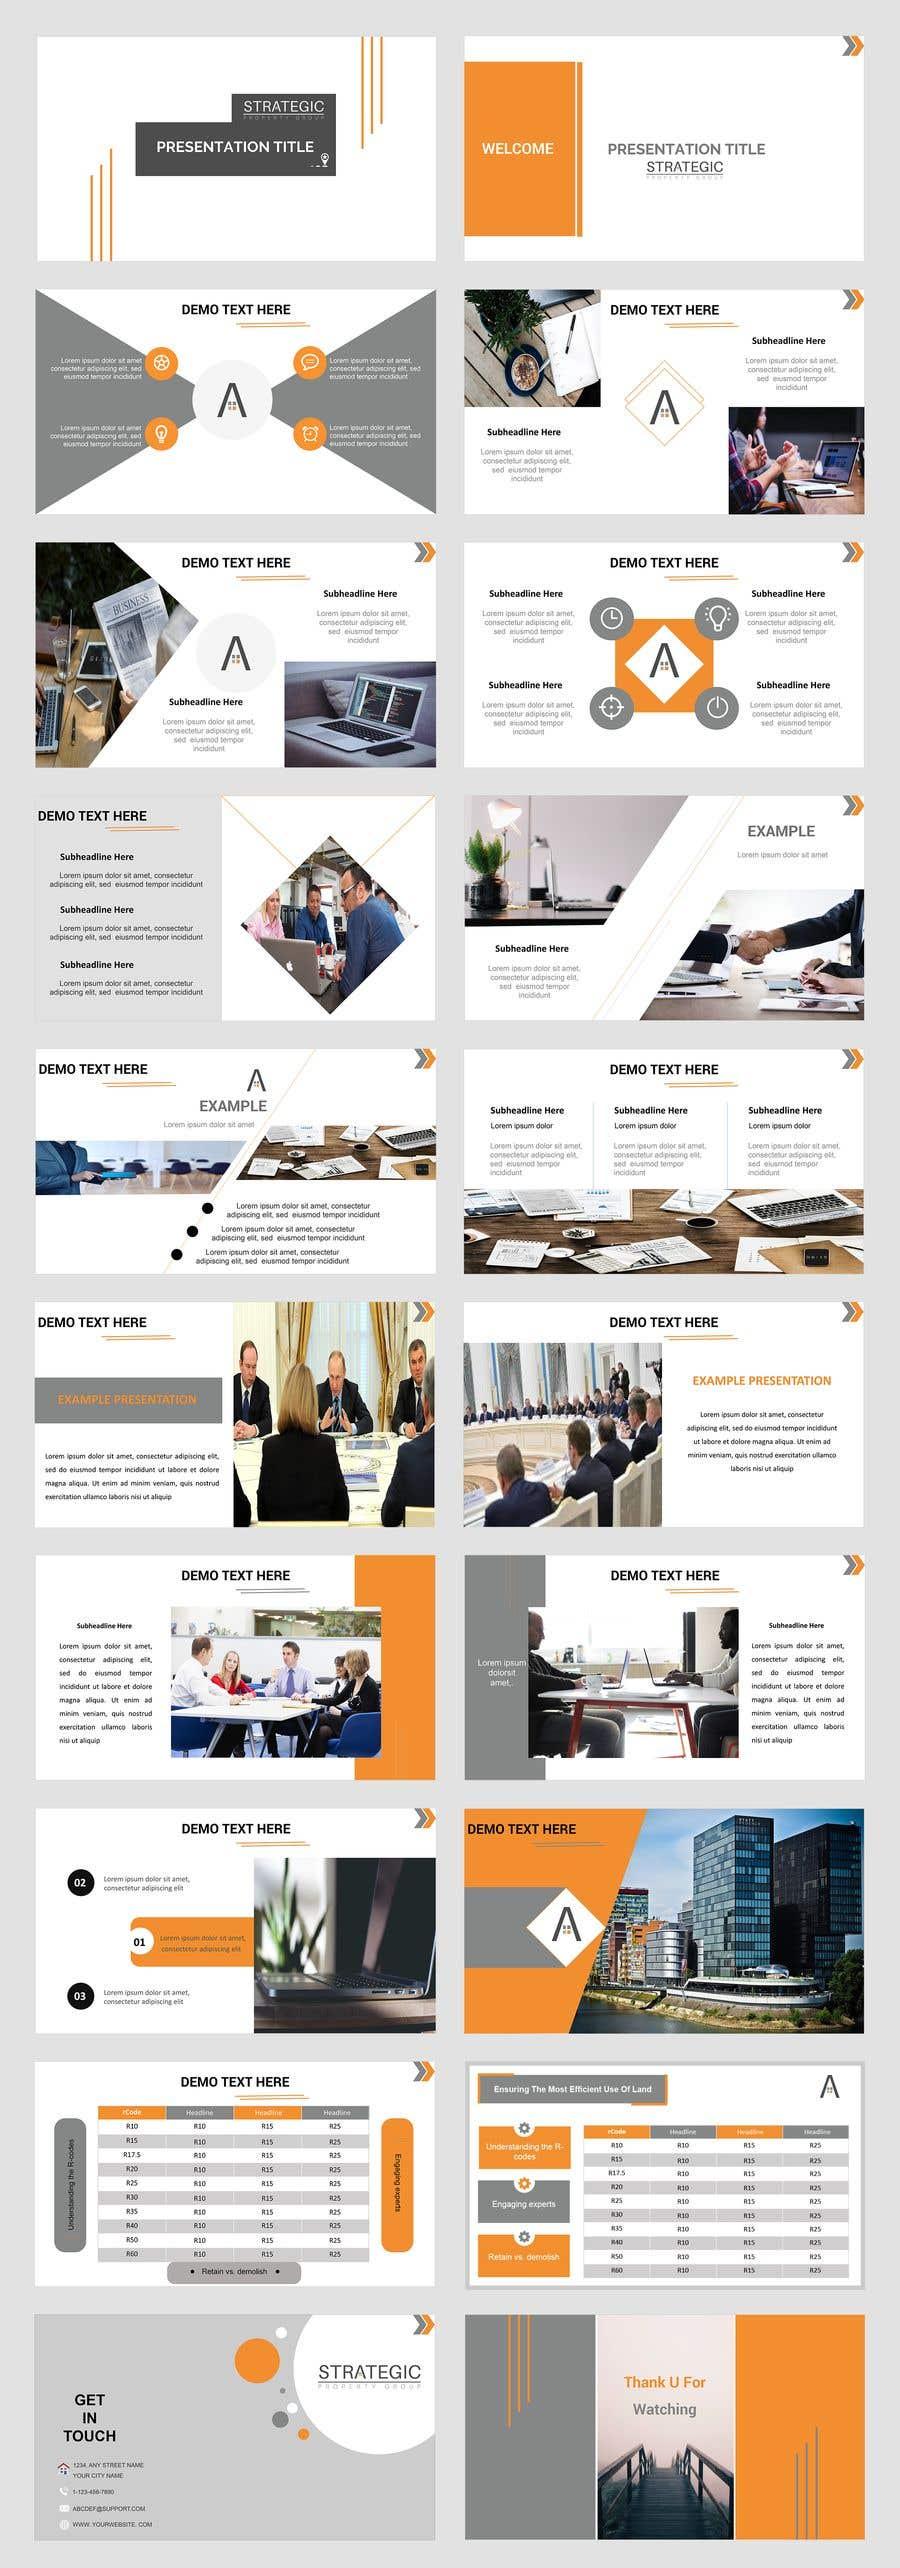 Bài tham dự cuộc thi #11 cho Create a PPT template for my business